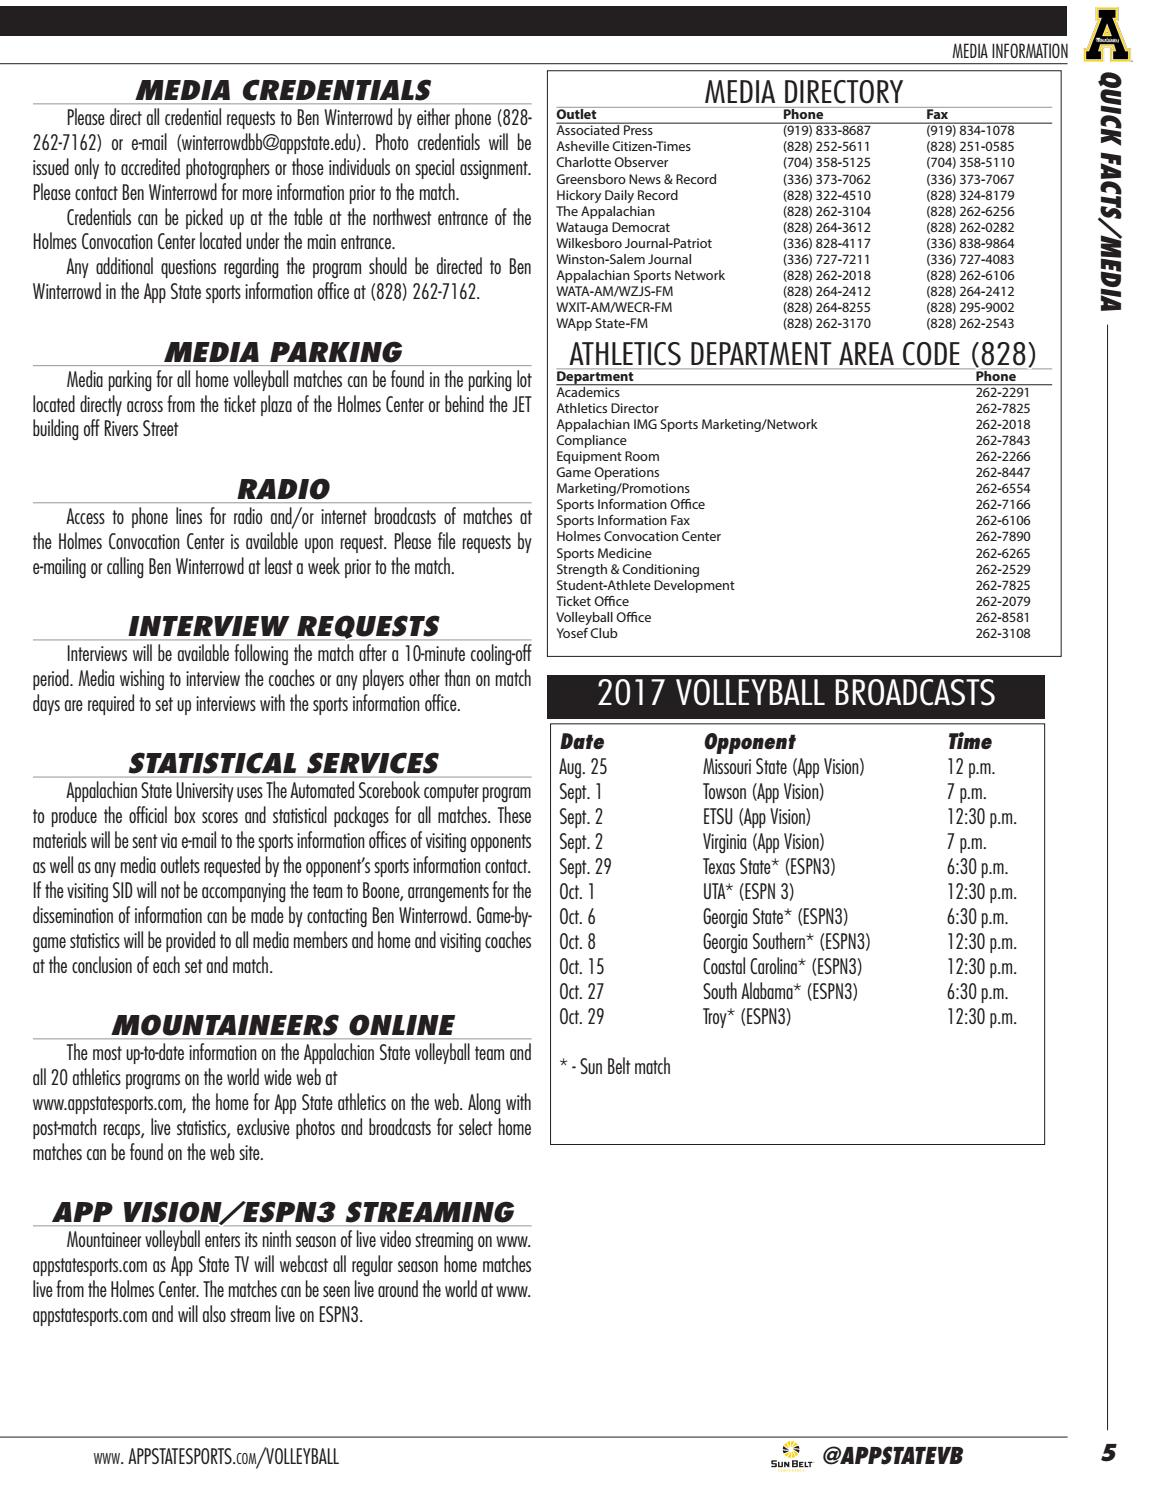 2017 Appalachian State Volleyball Media Guide by Appalachian